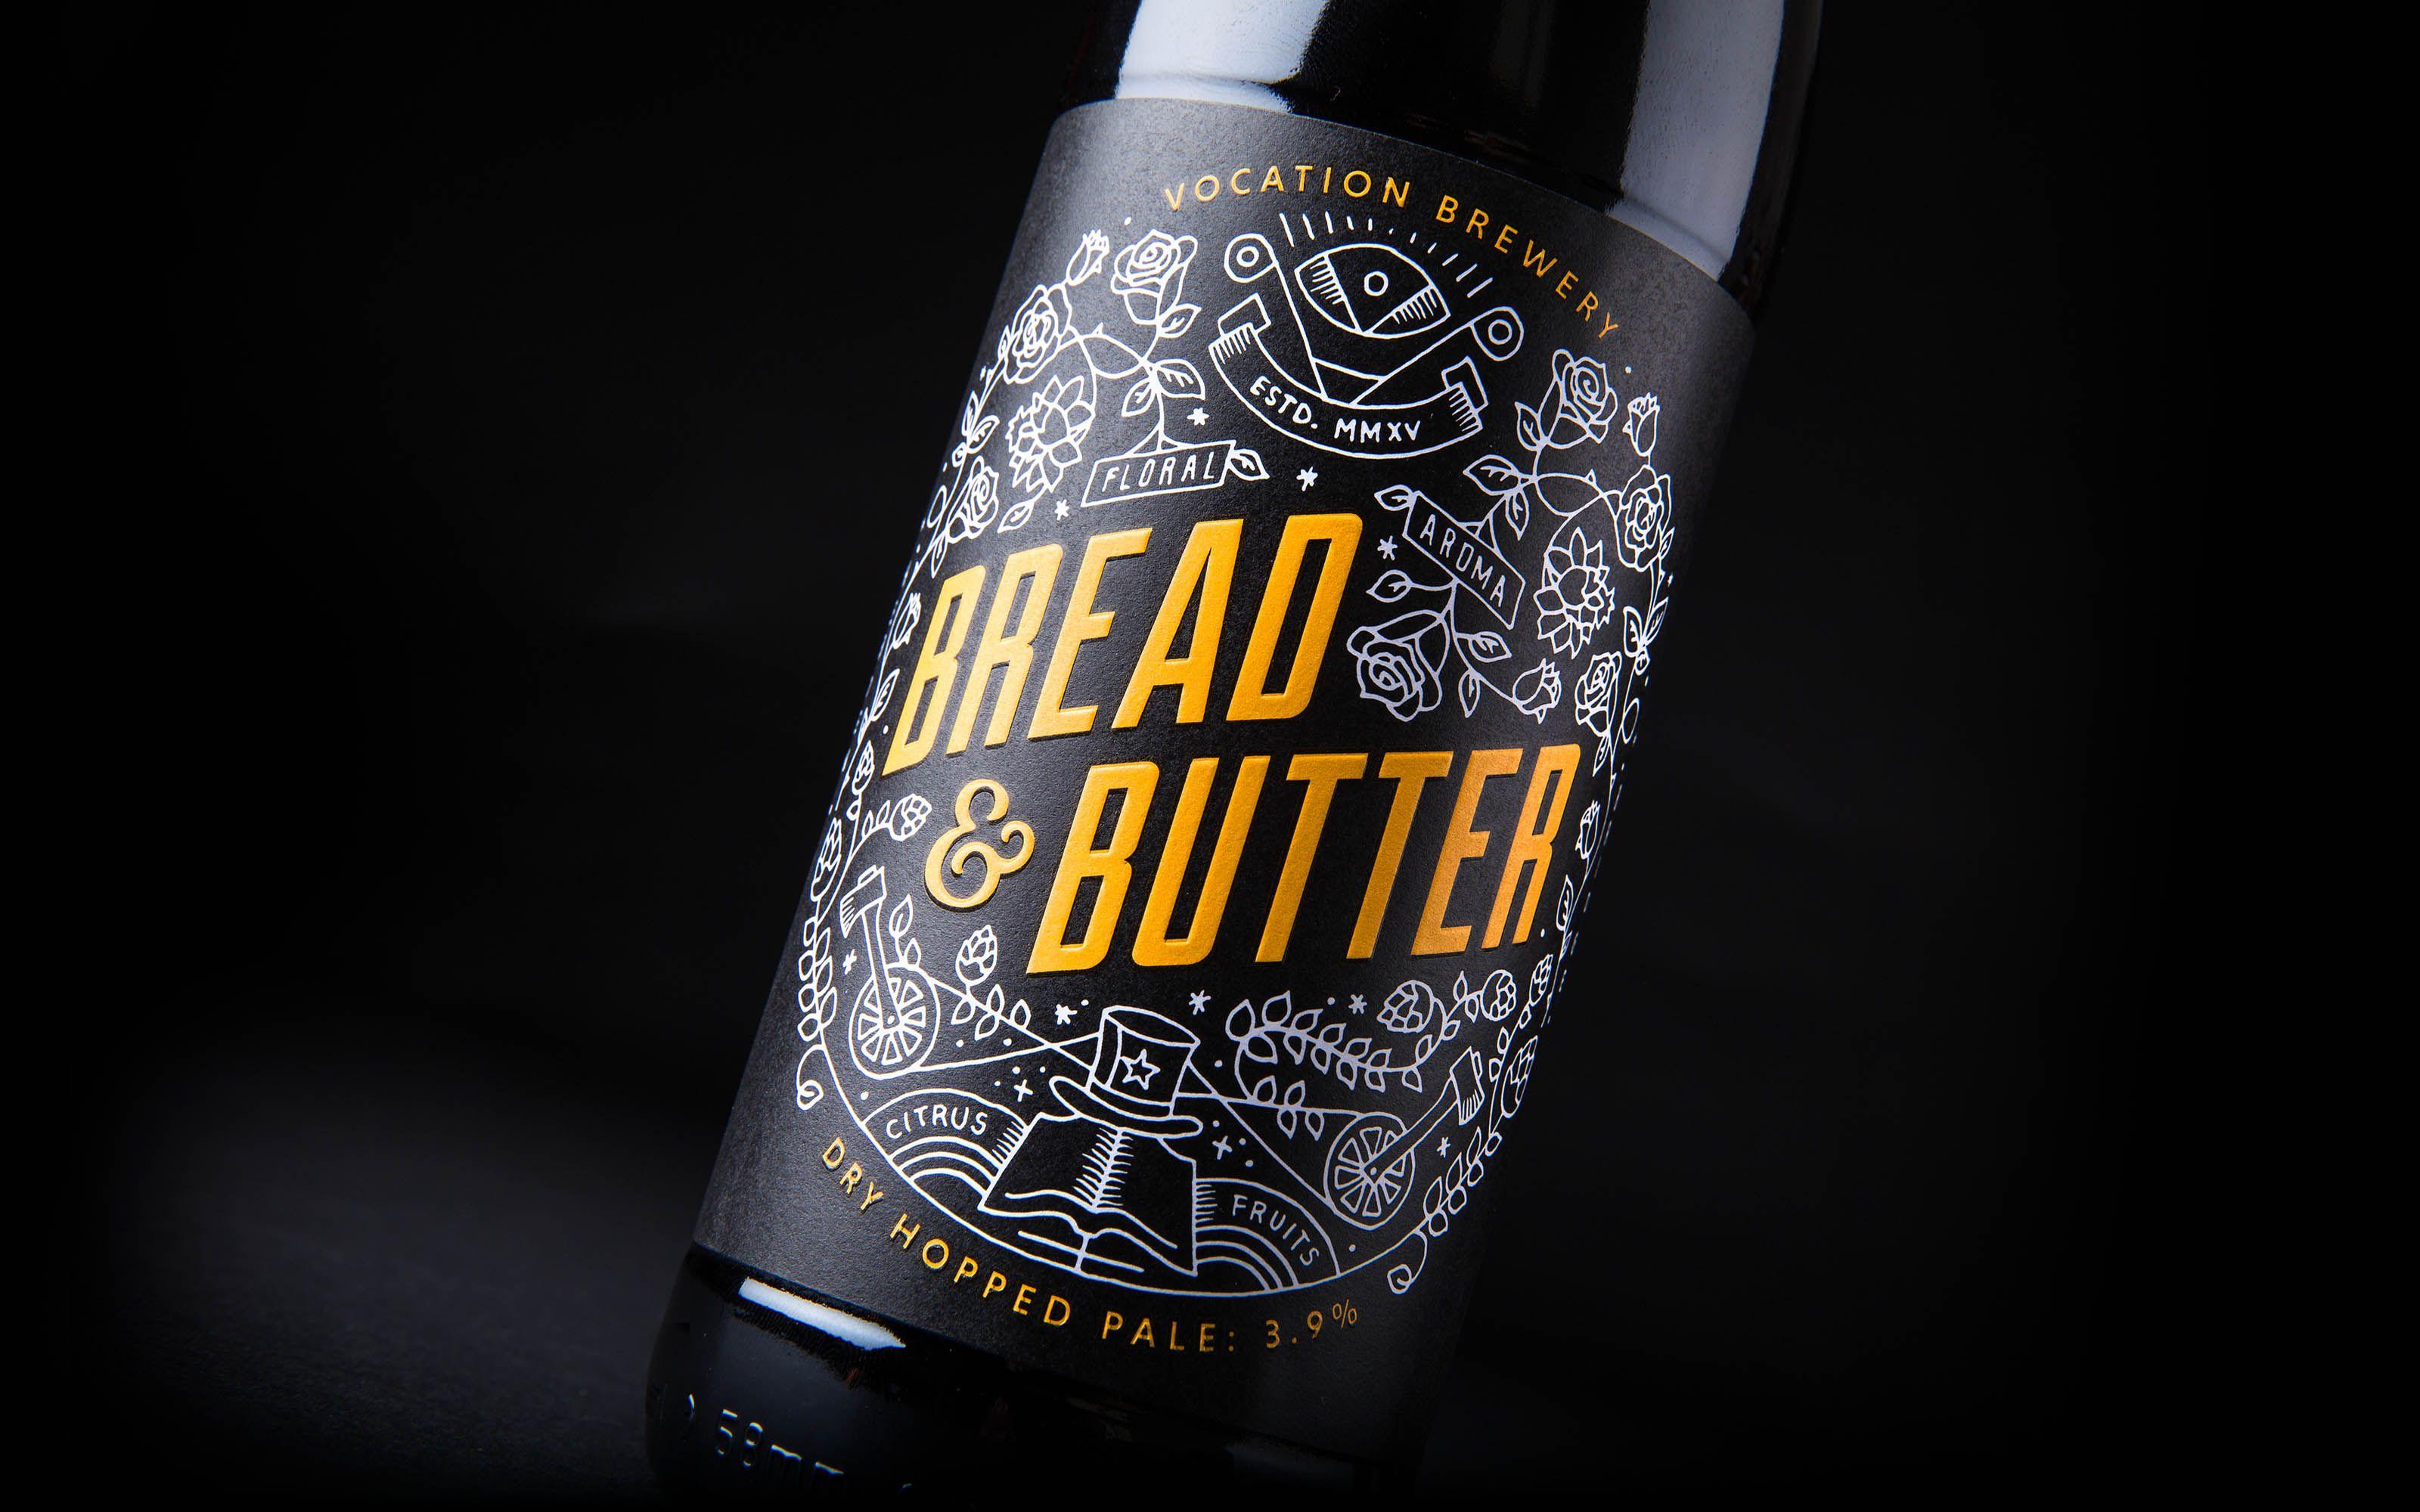 Vocation Brewery « Creative Agency, Branding & Packaging Design | Leeds